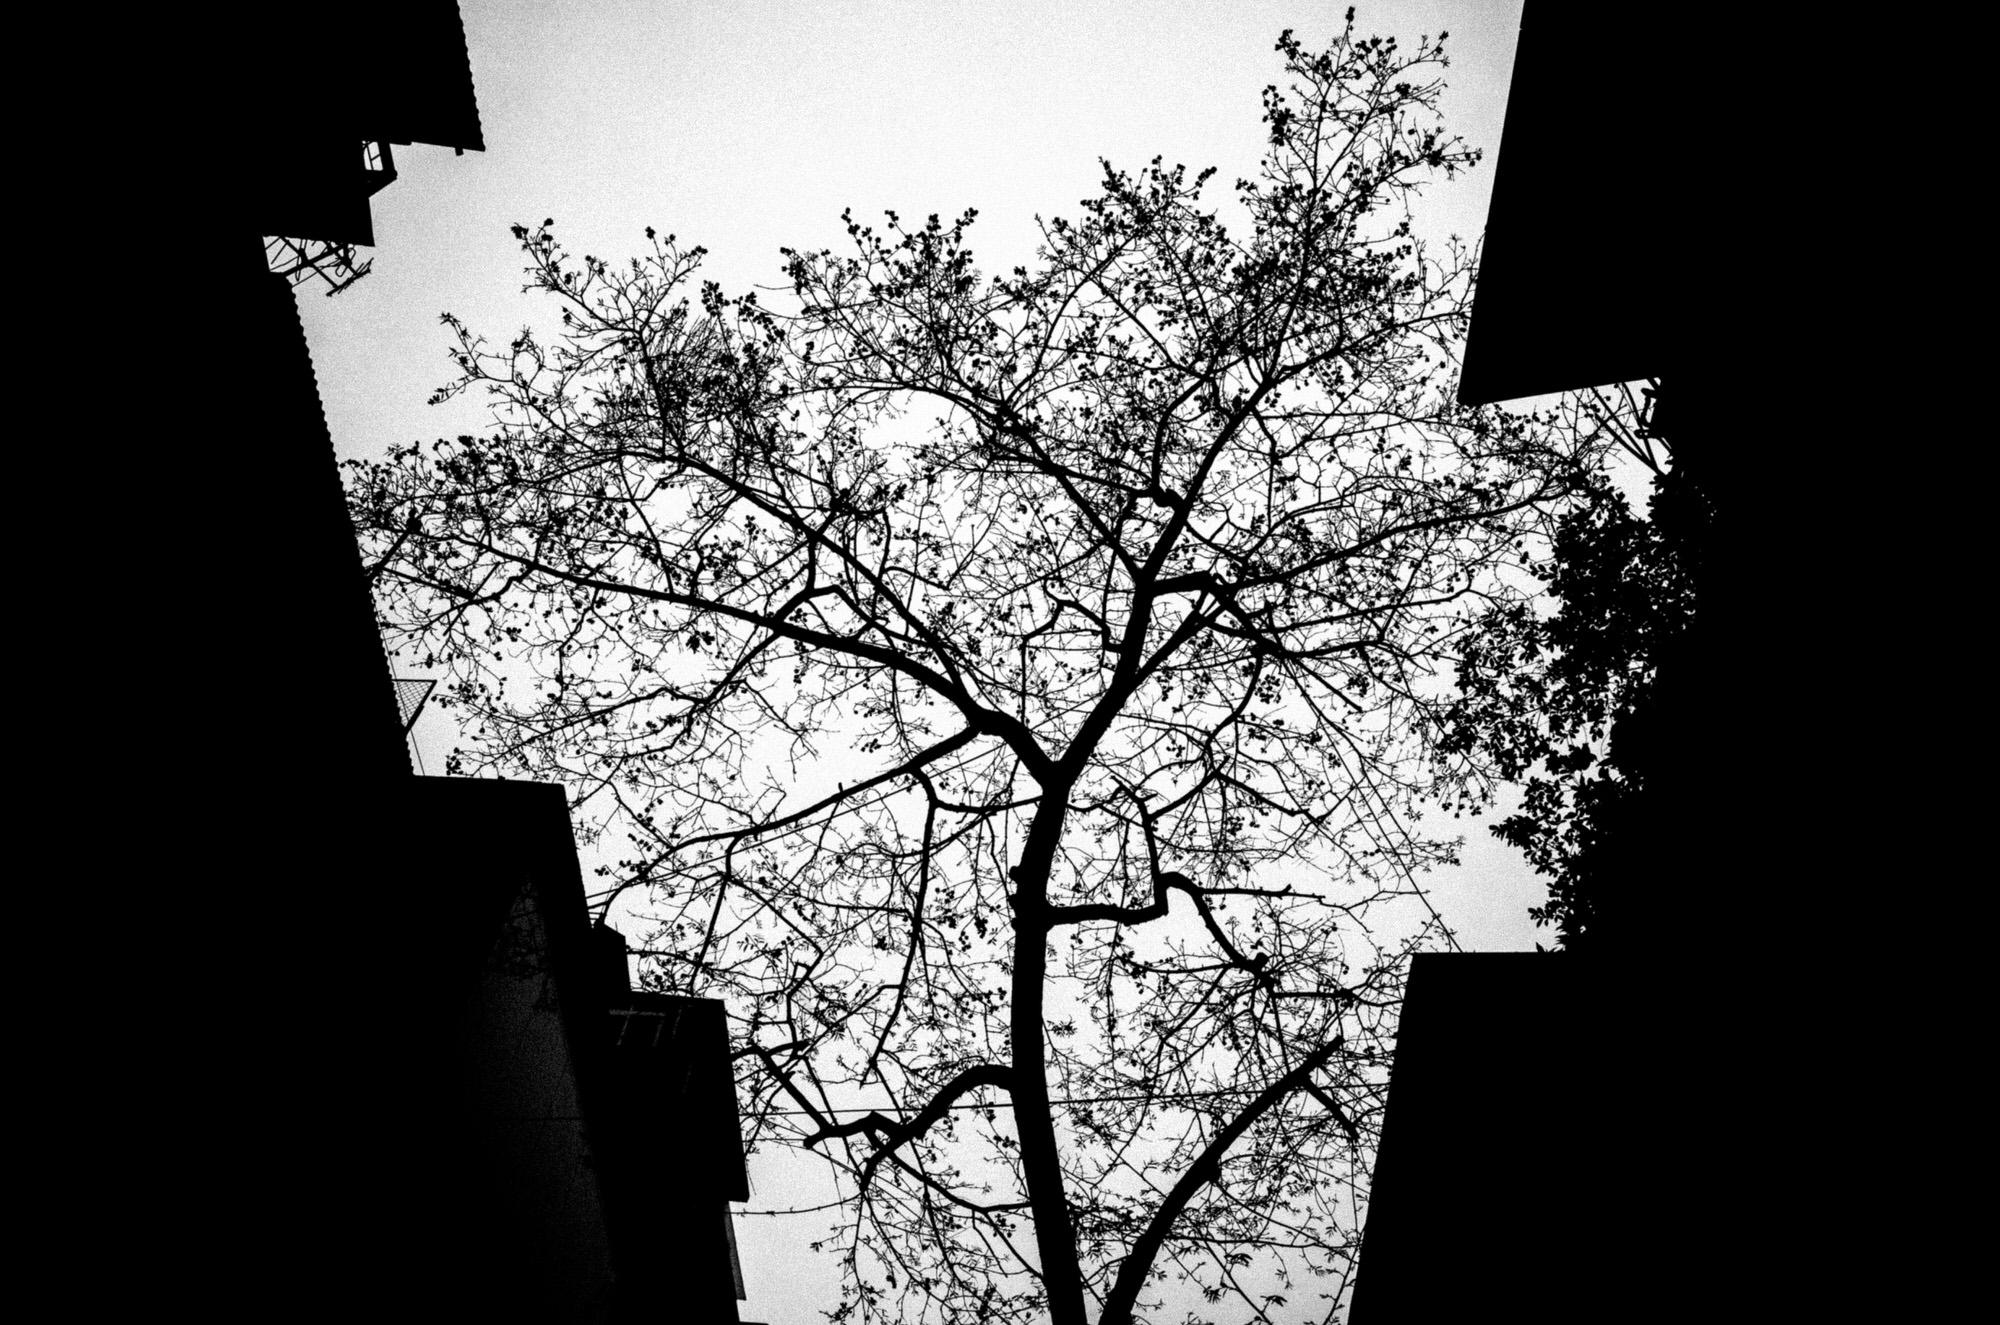 eric kim photography black and white - eric kim black and white photography hanoi-0010454